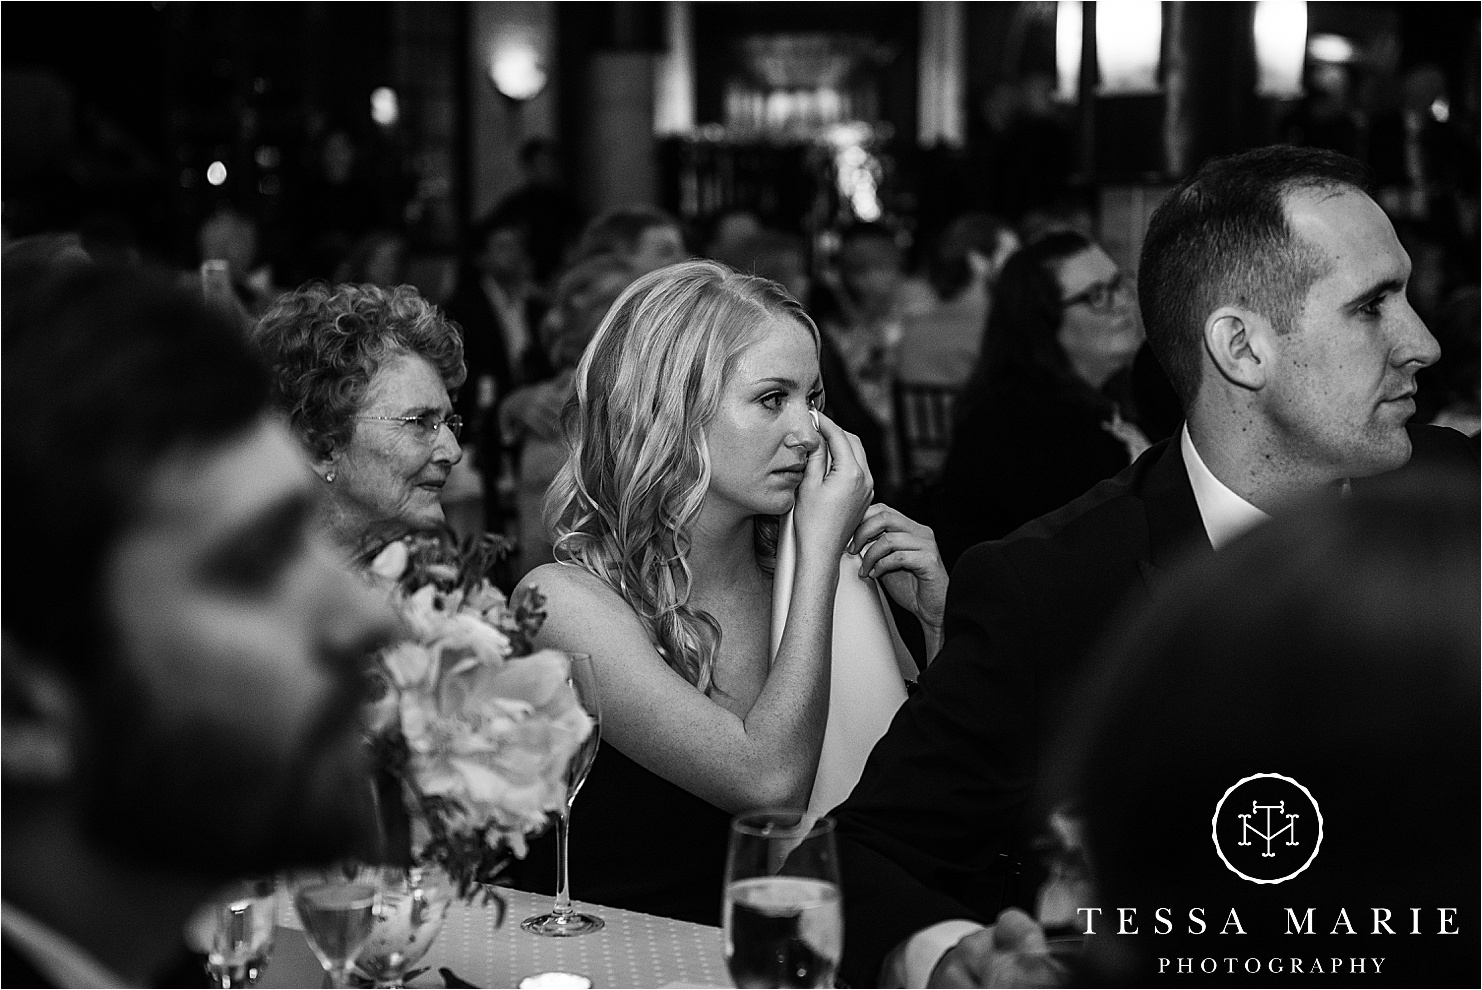 Tessa_marie_weddings_houston_wedding_photographer_The_astorian_0160.jpg